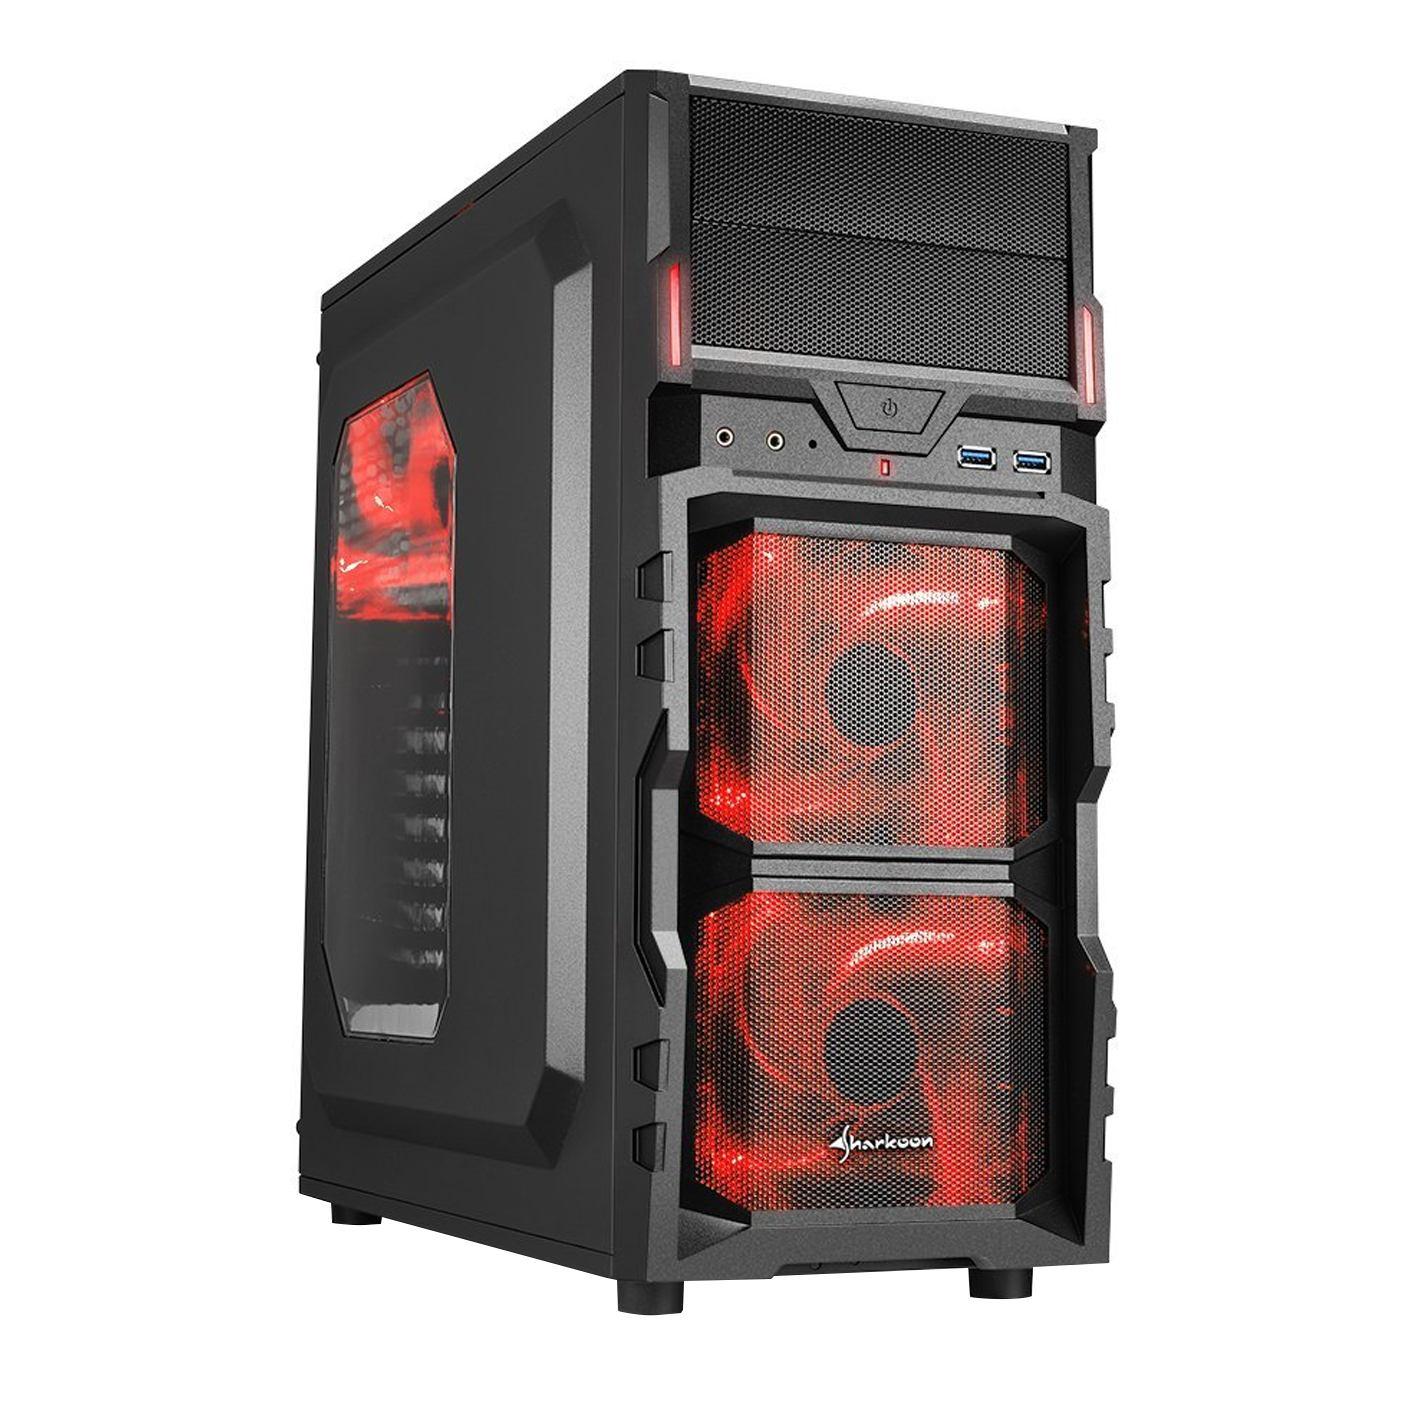 2022274-Sharkoon-VG5-W-vane-portacomputer-Midi-ATX-Tower-Nero-VG5-W-RED-ATX